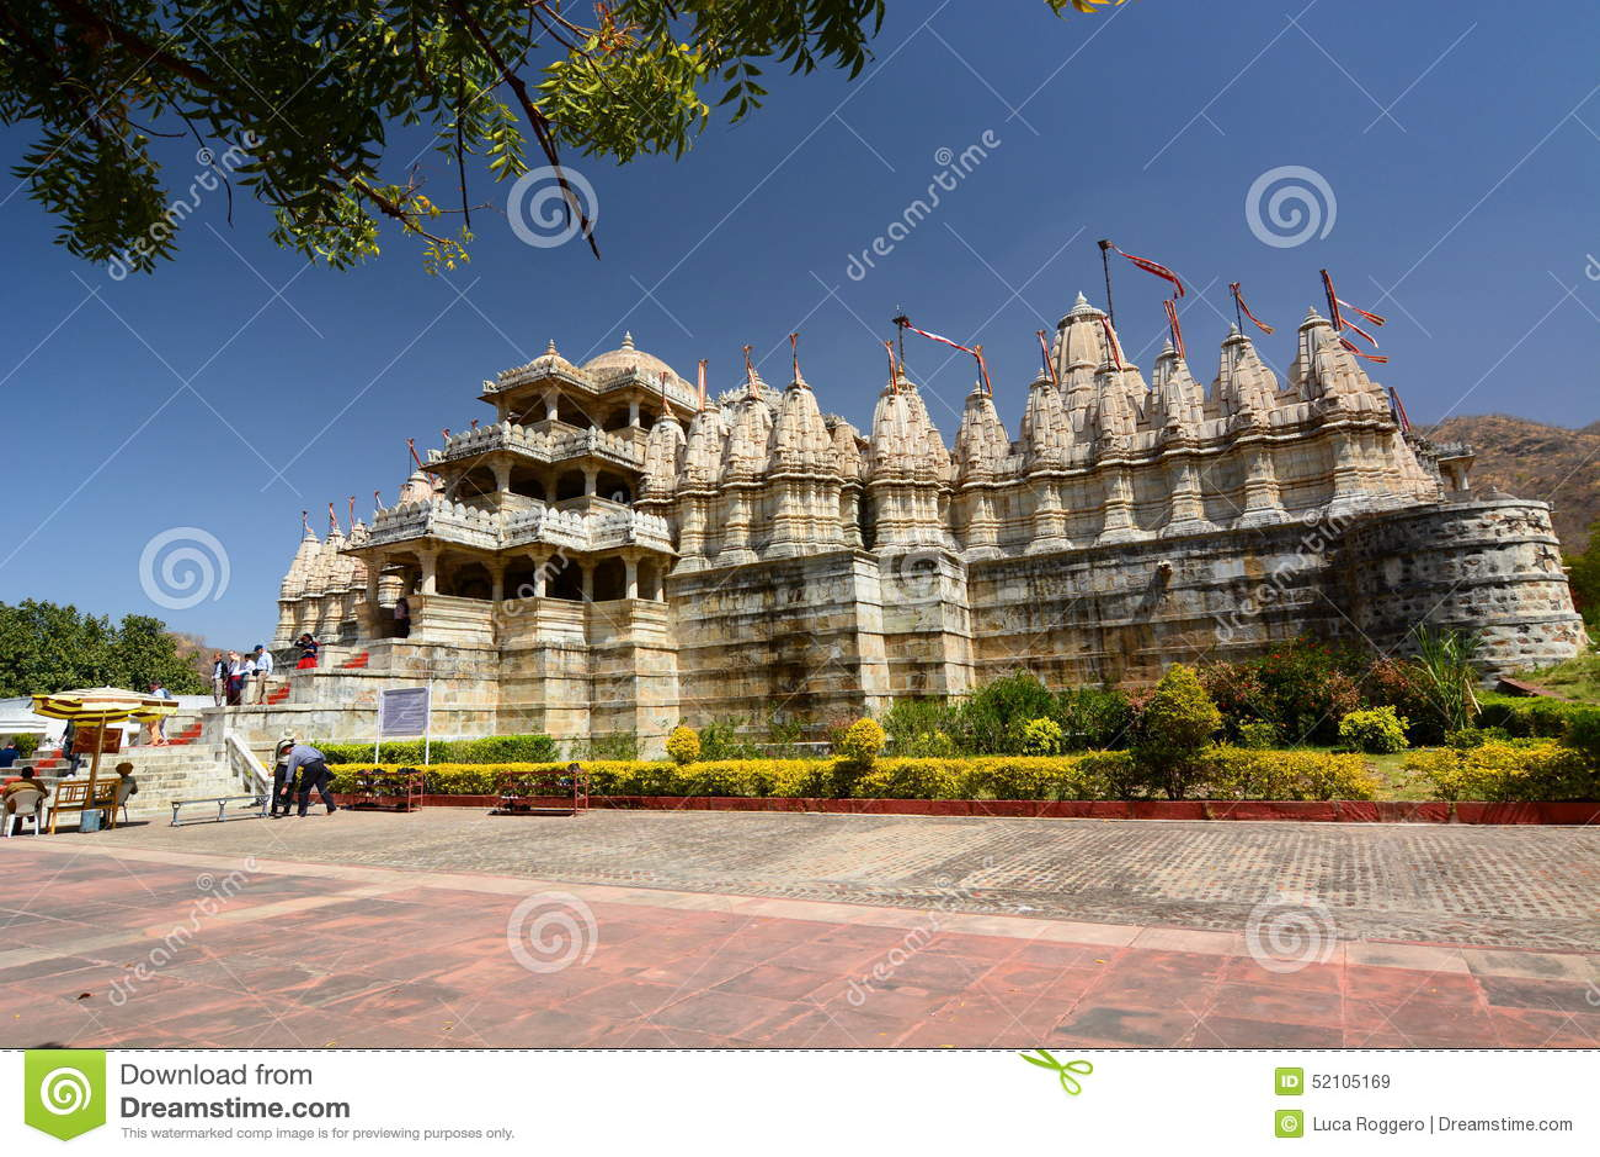 Jain tempel Ranakpur Rajasthan india